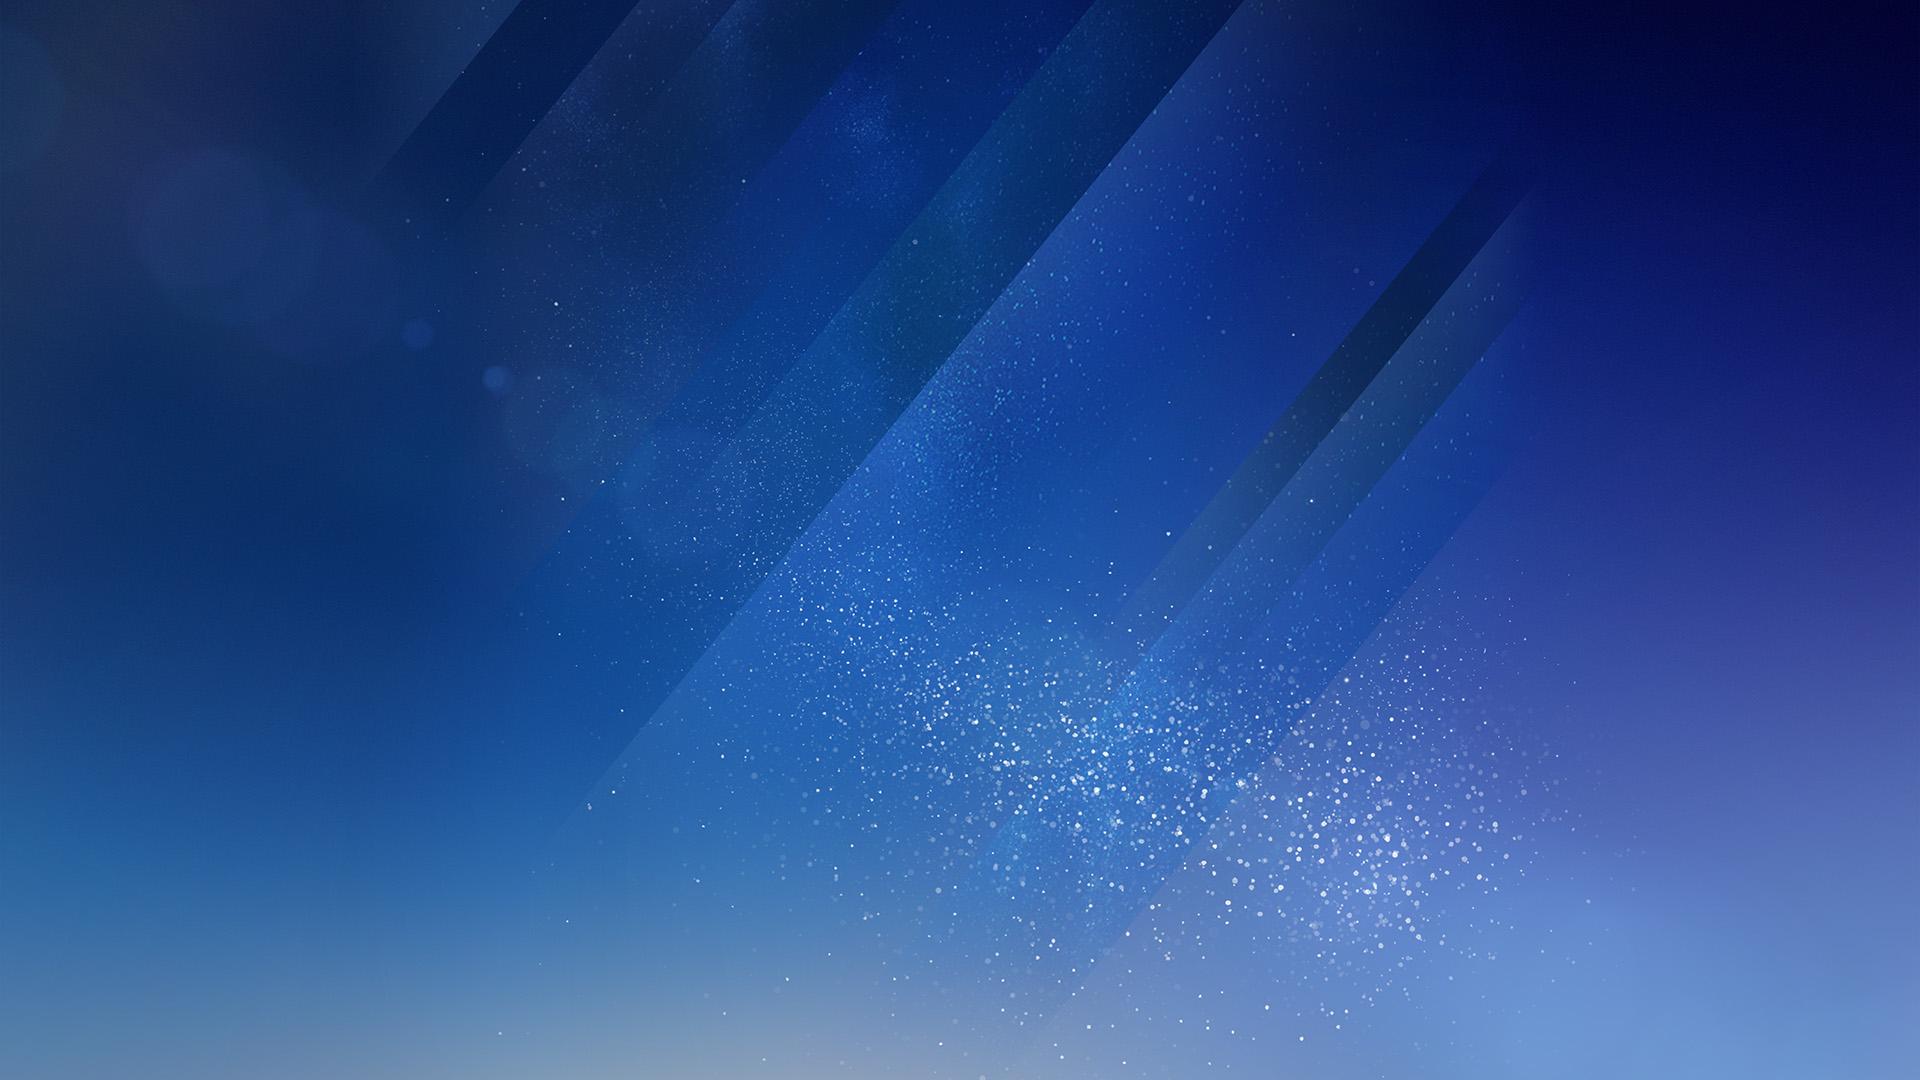 Wa76 Galaxy S8 Blue Pattern Background Samsung Wallpaper